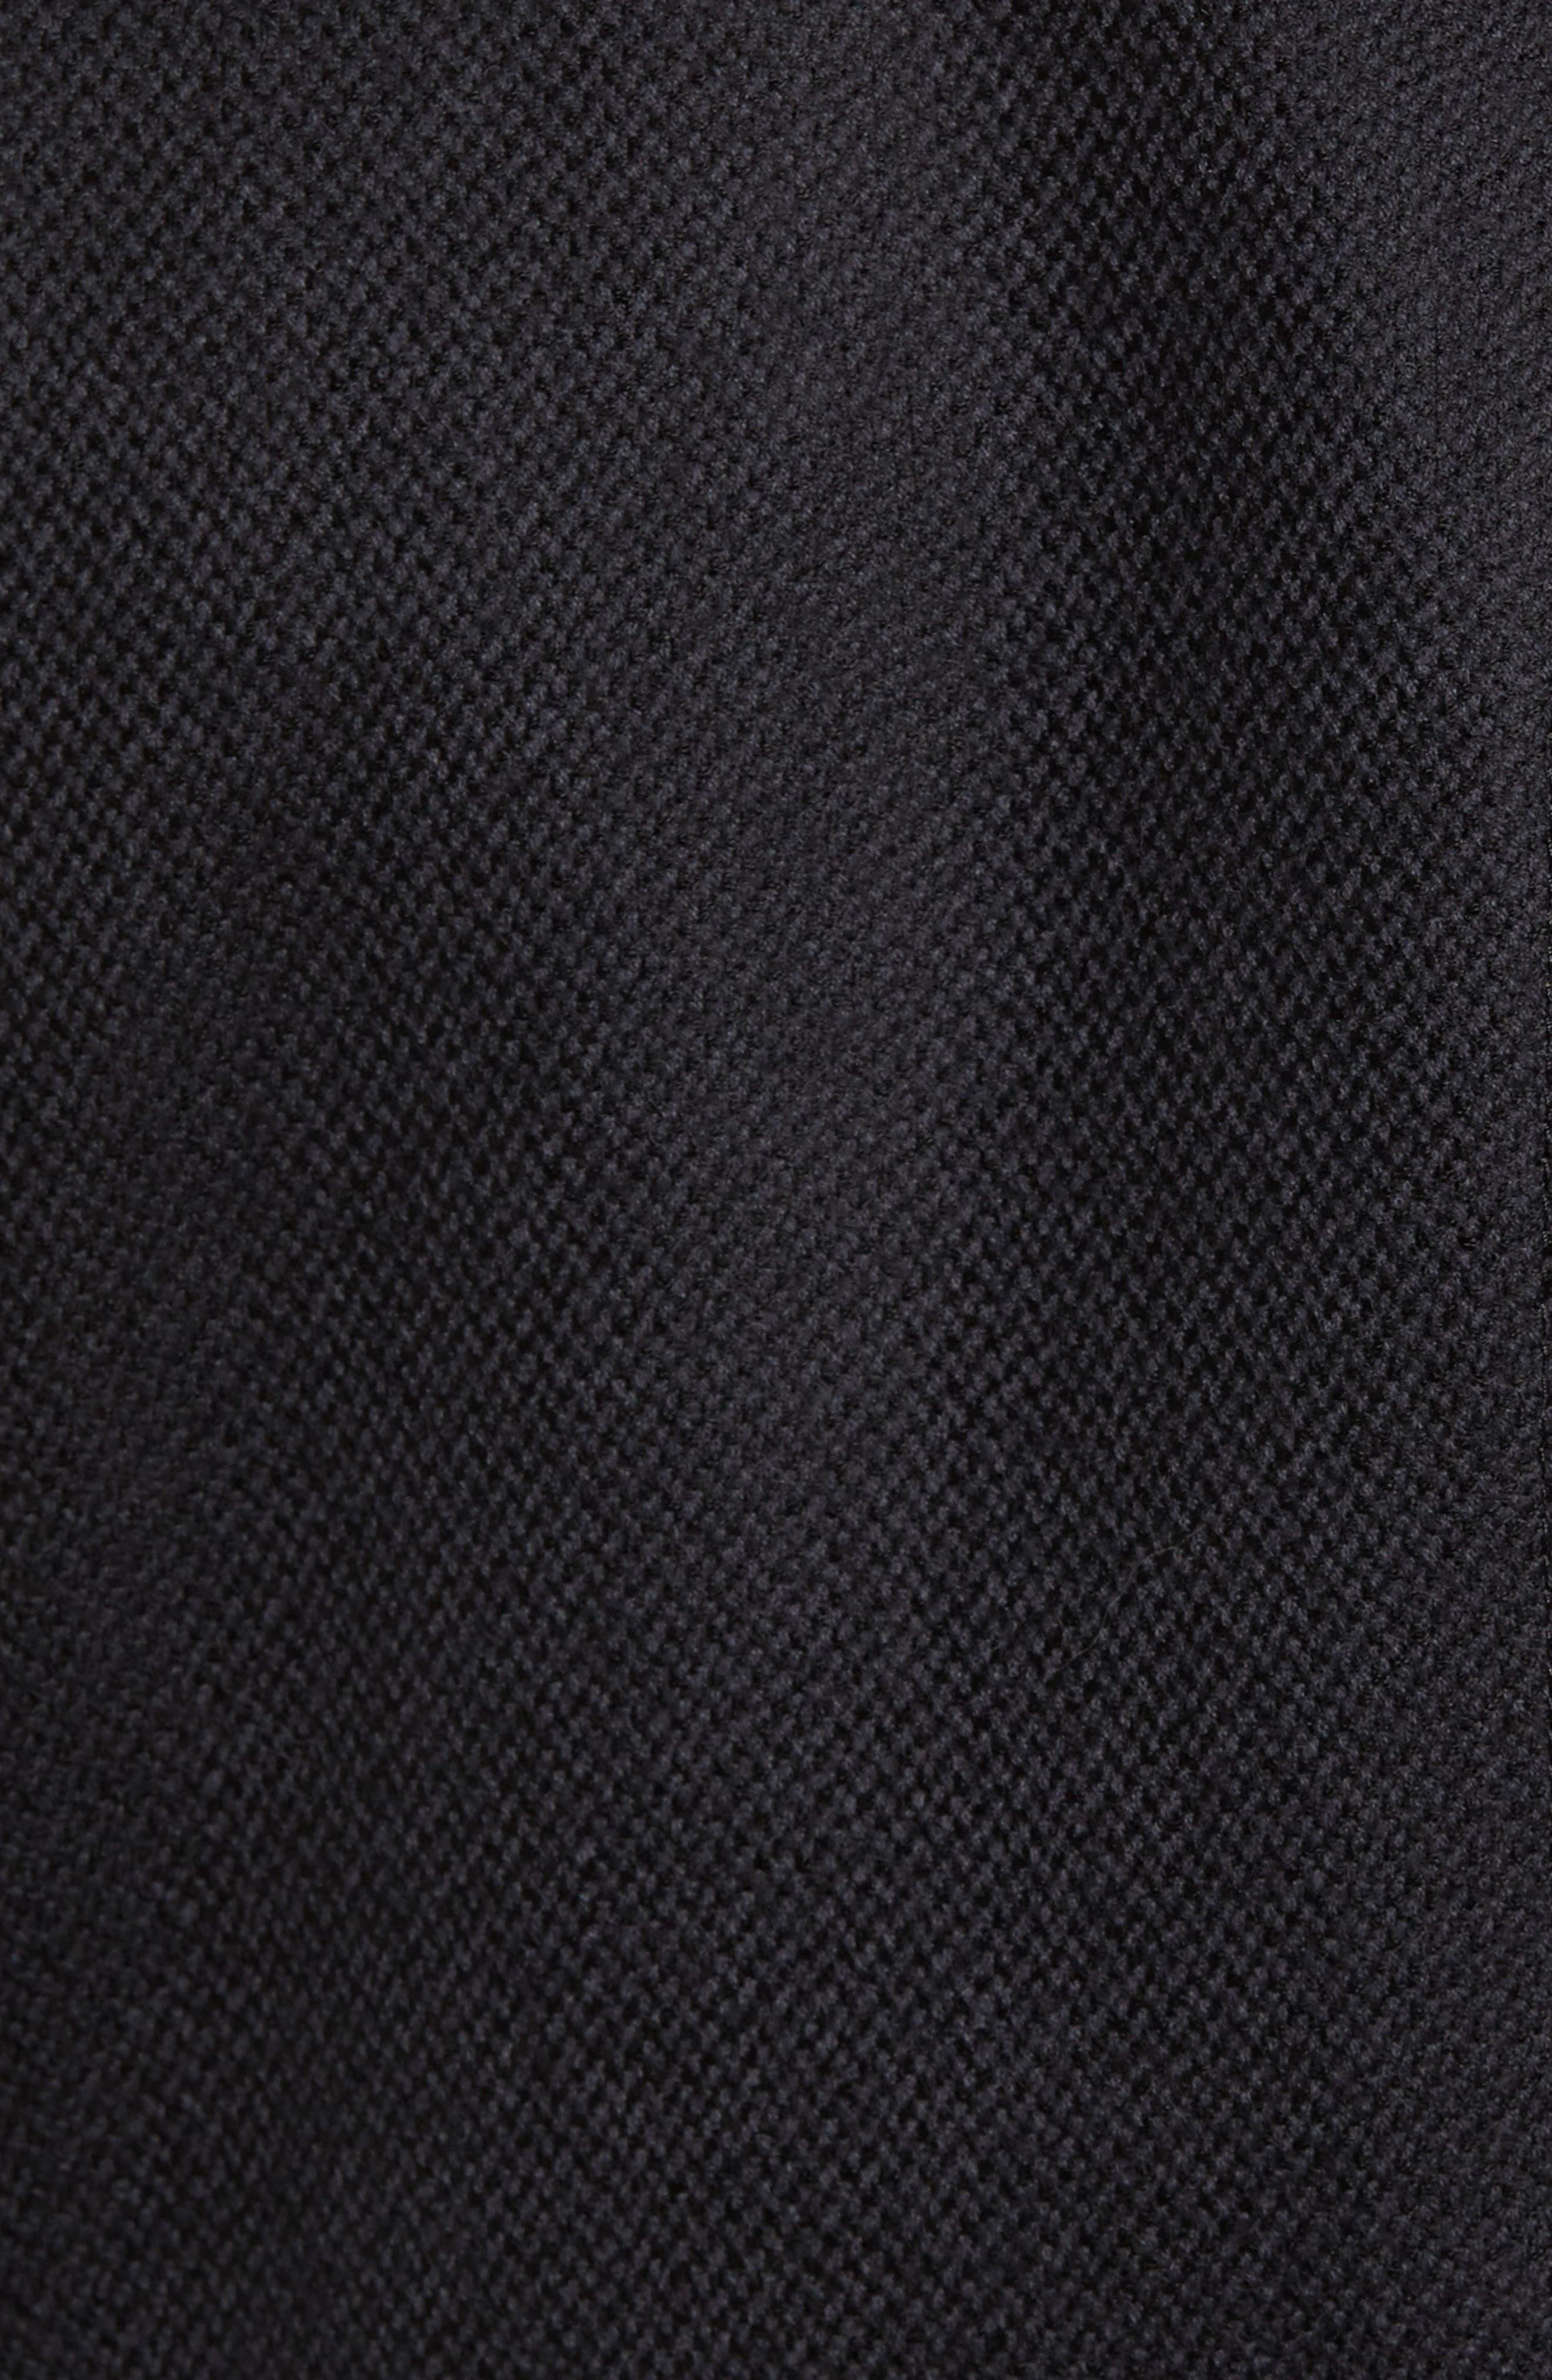 Alternate Image 5  - Kroon Ritchie Aim Hybrid Classic Fit Wool & Cashmere Sport Coat